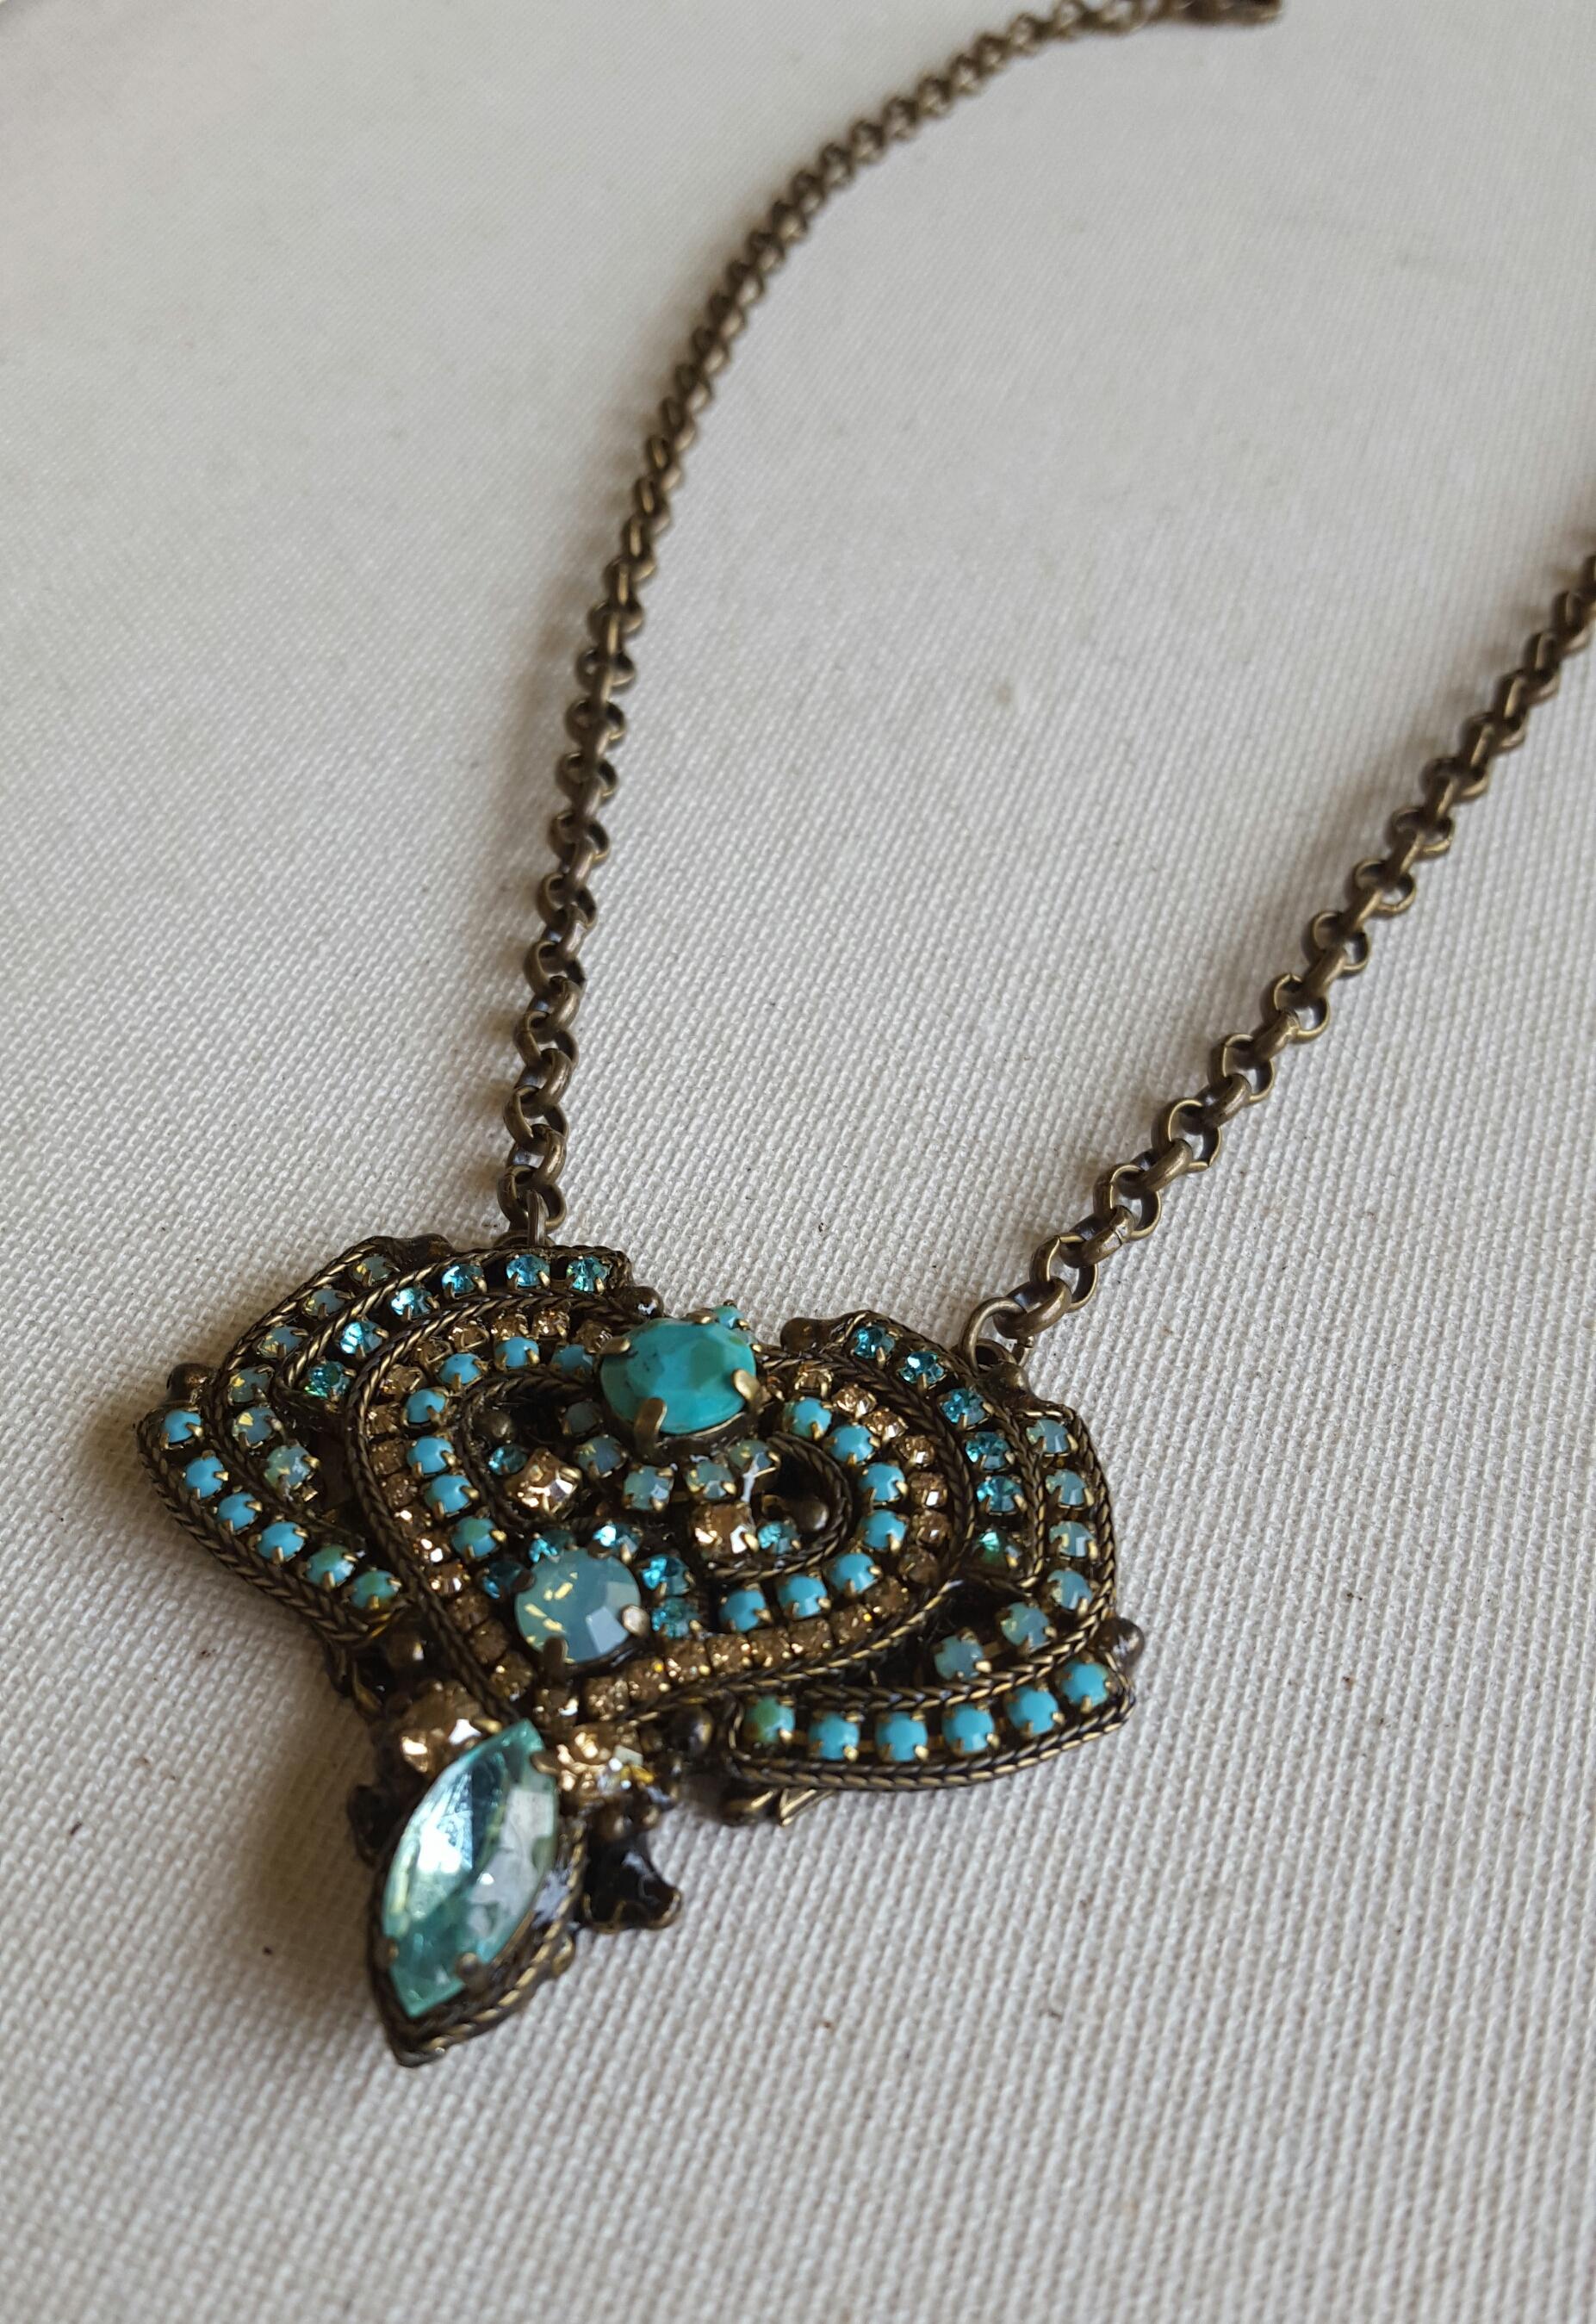 Swarovski Crystal: Aquamarine, Pacific Opal, Topaz Semi-Precious: Turquoise